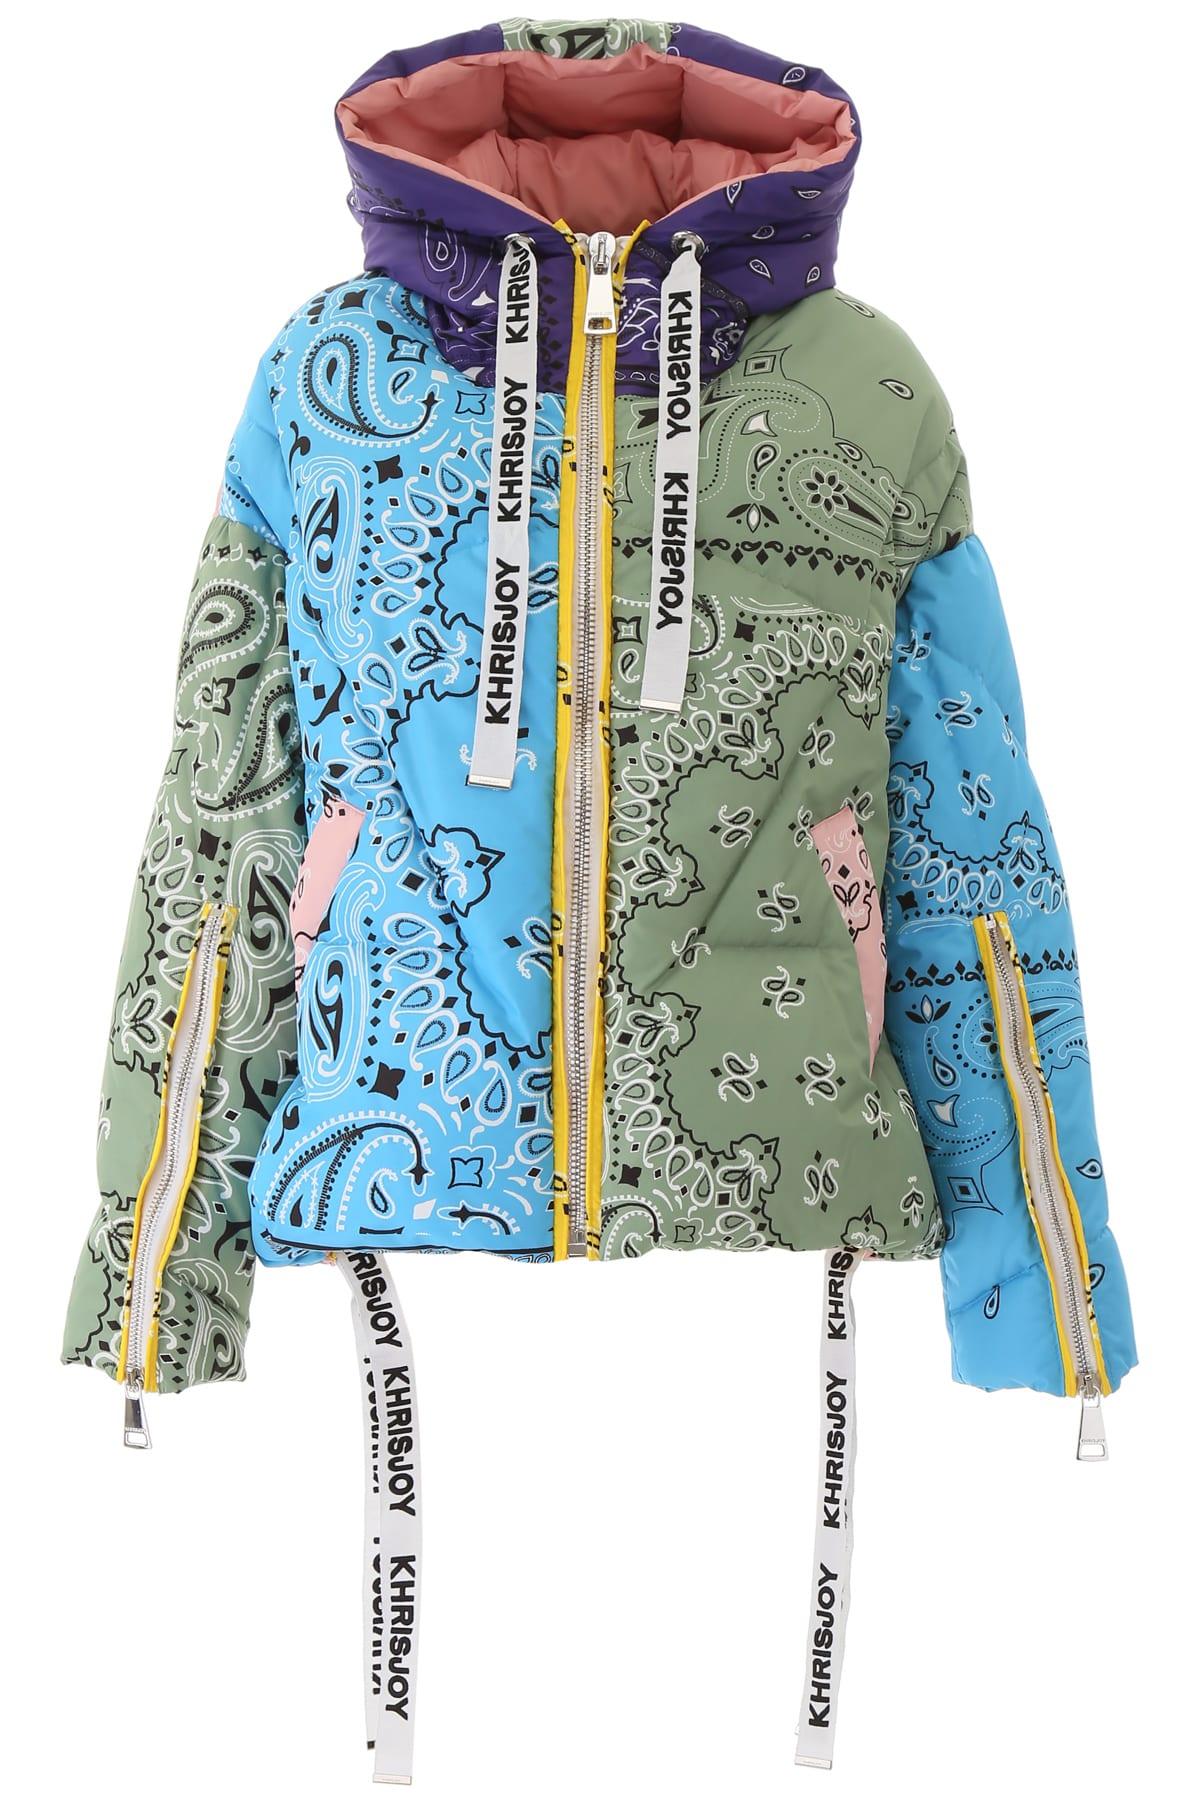 Khrisjoy Bandana Khris Puffer Jacket